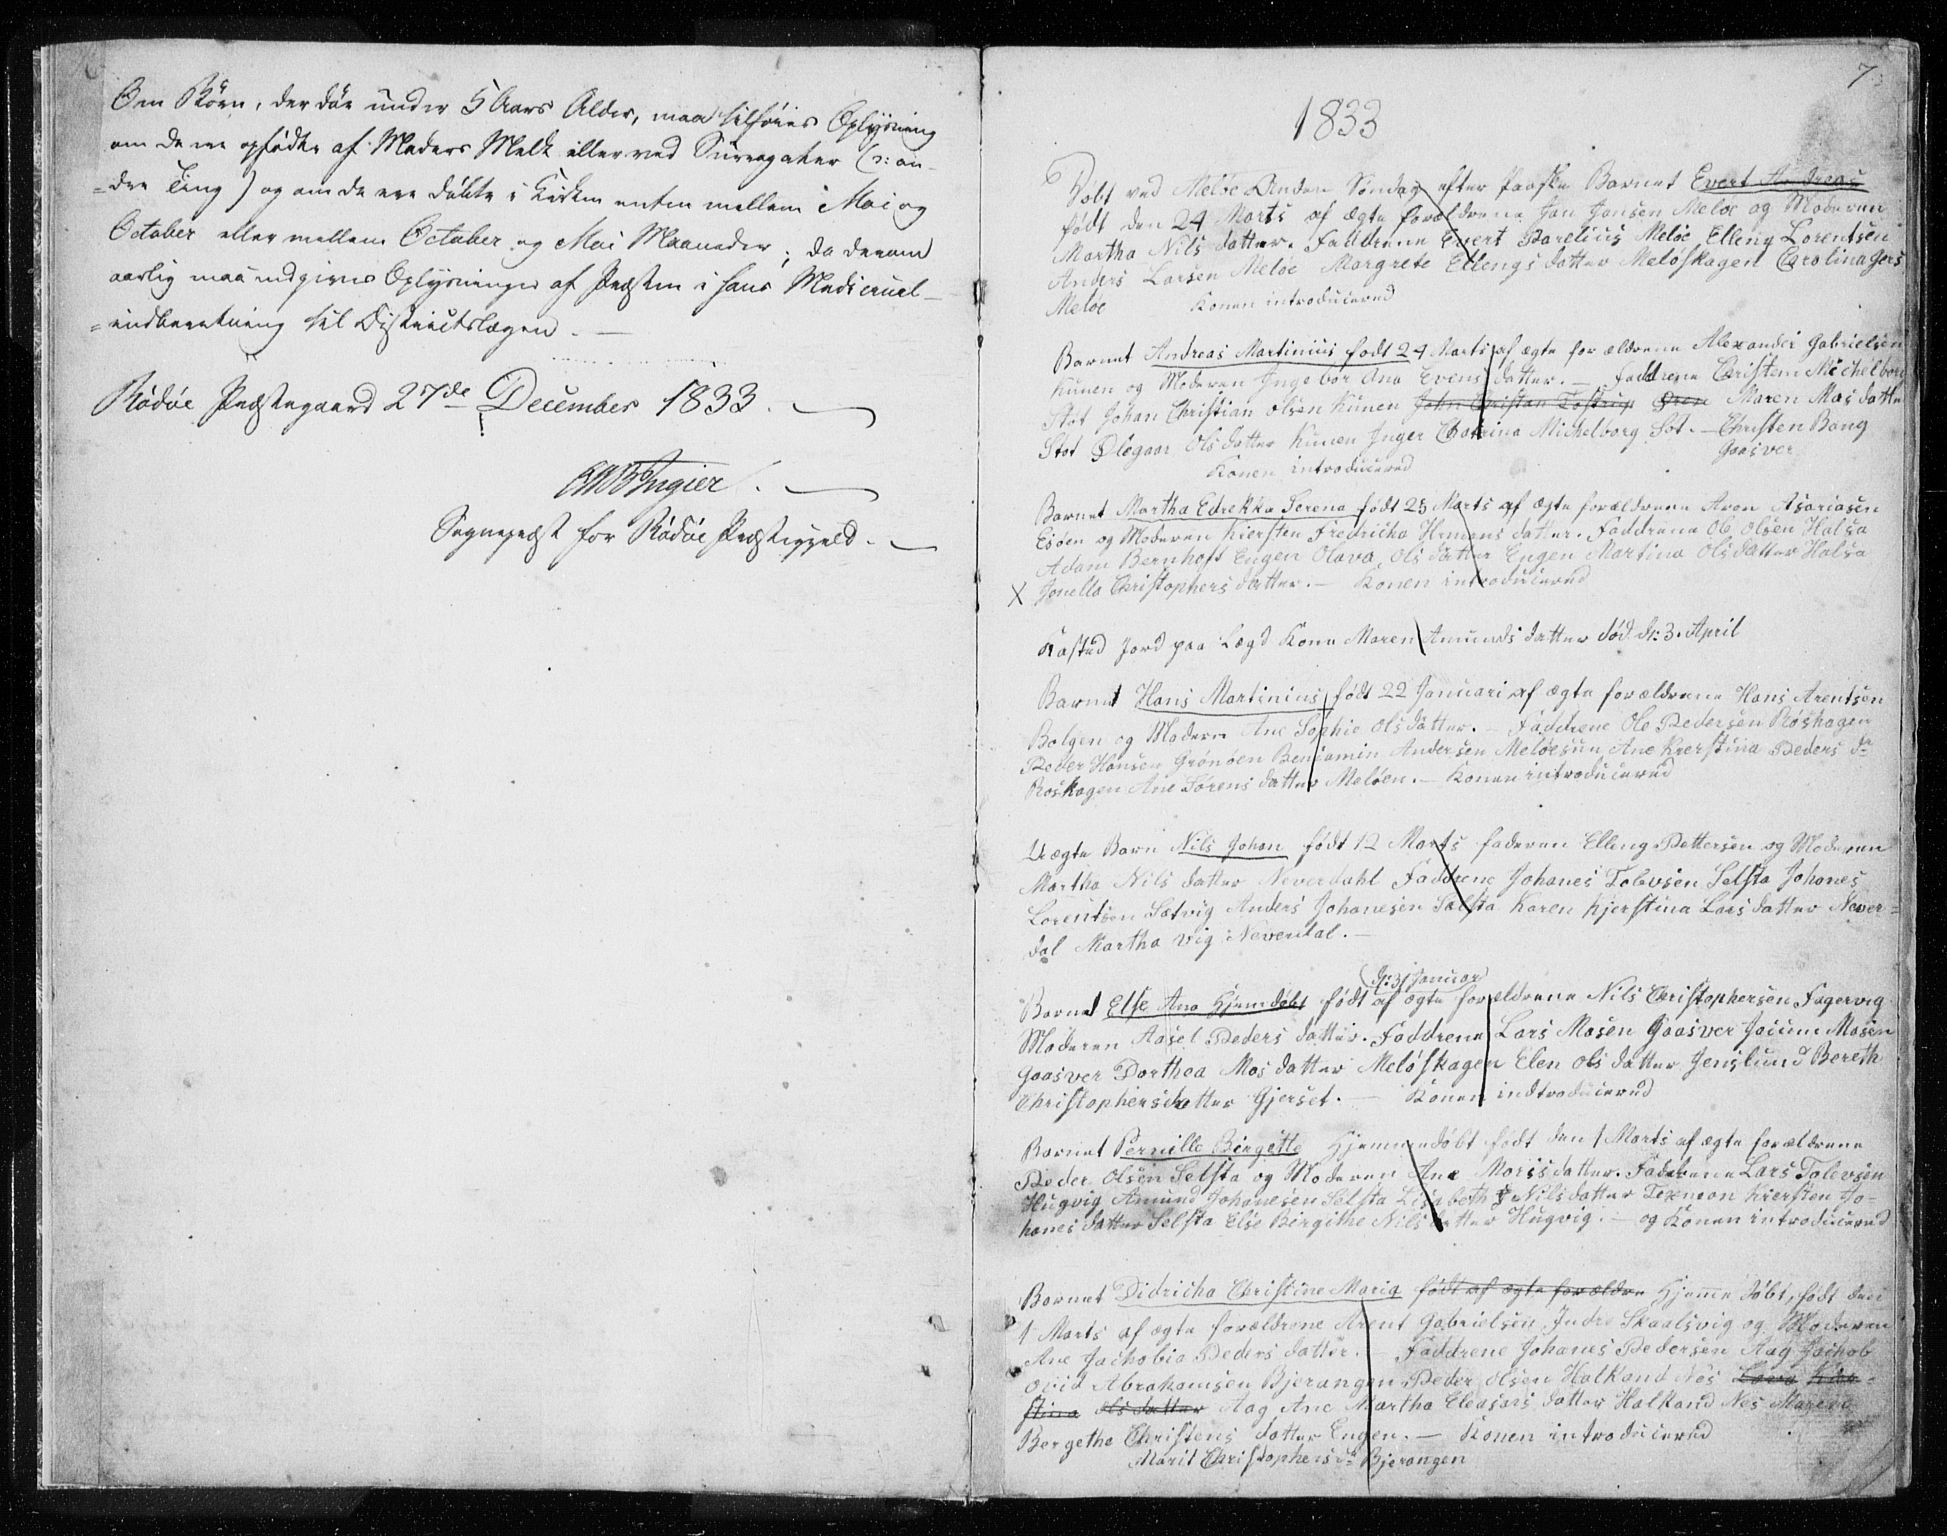 SAT, Ministerialprotokoller, klokkerbøker og fødselsregistre - Nordland, 843/L0632: Klokkerbok nr. 843C01, 1833-1853, s. 6-7